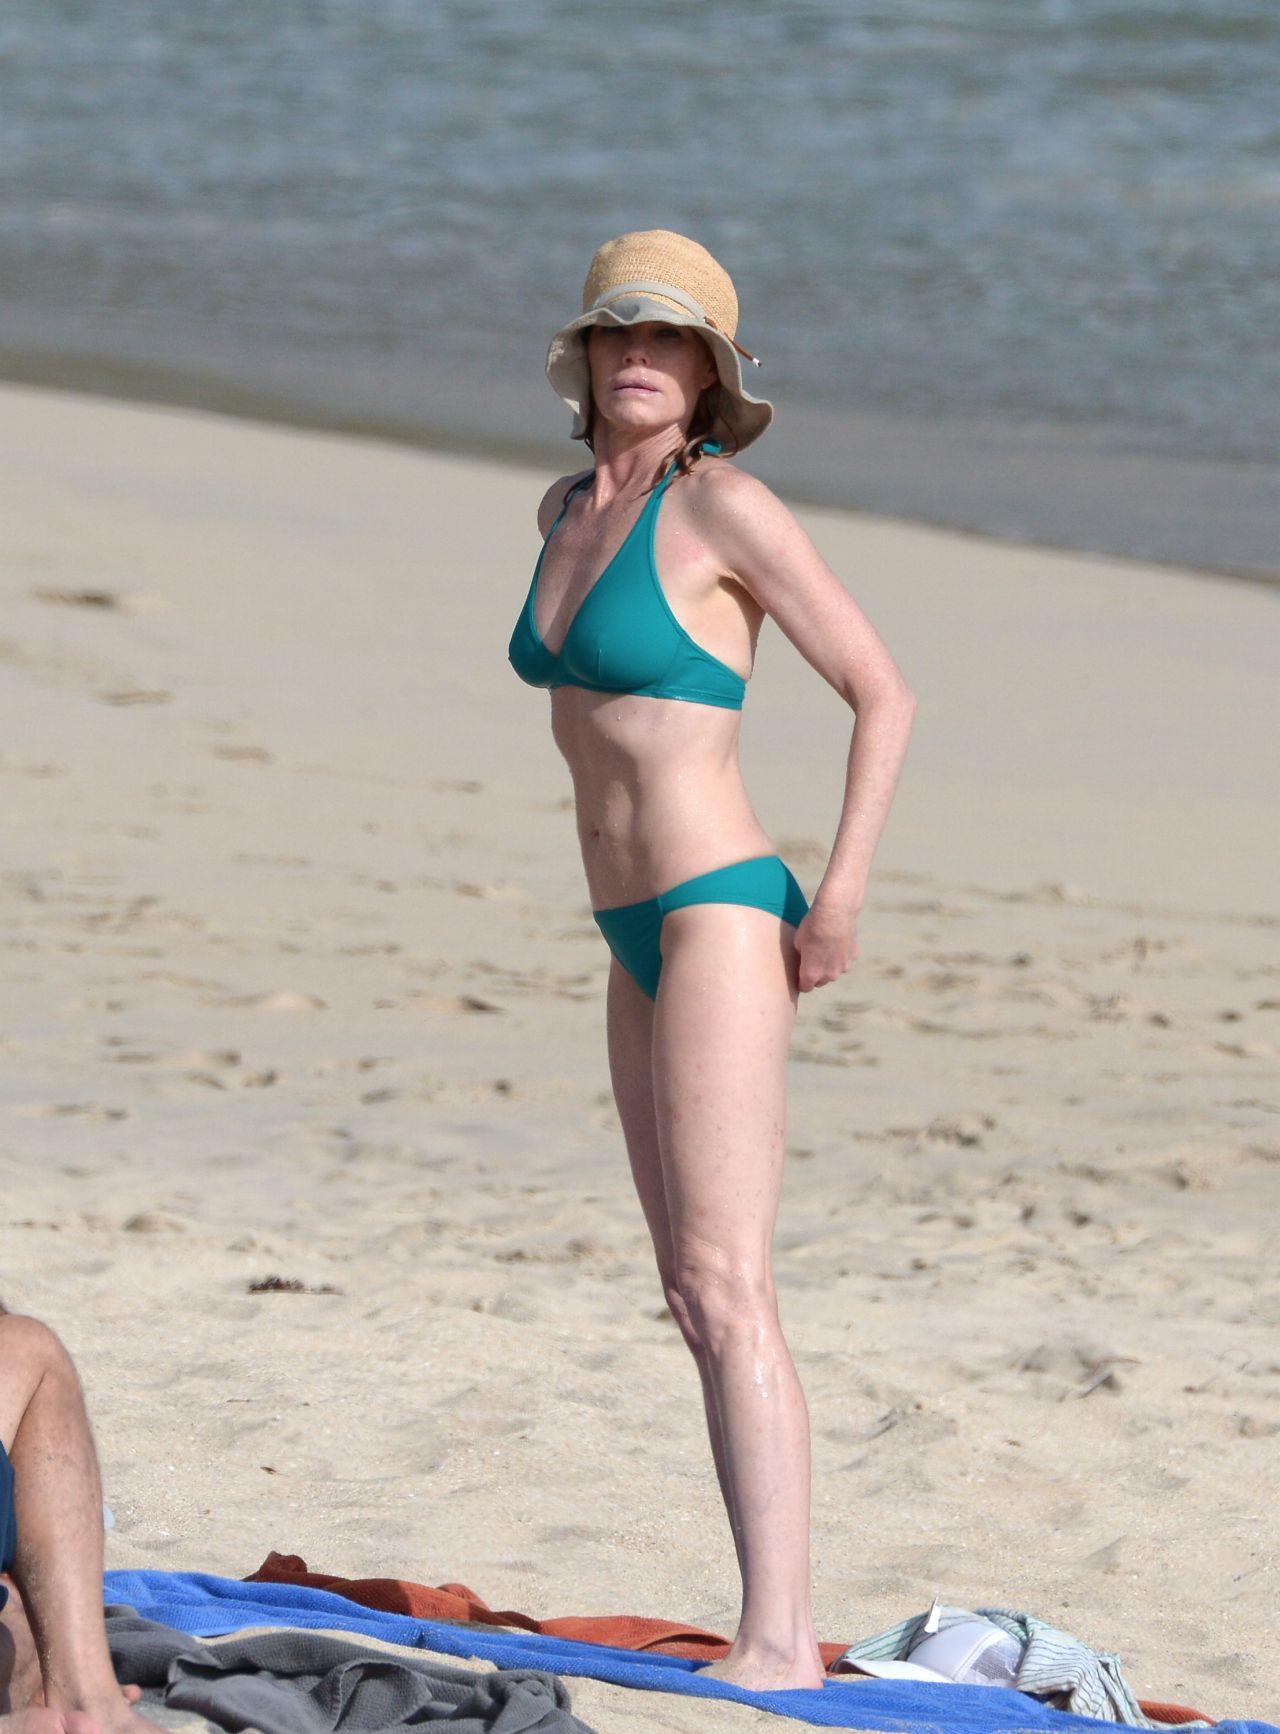 Marg Helgenberger Bikini Candids - St Barts, December 2013-1812